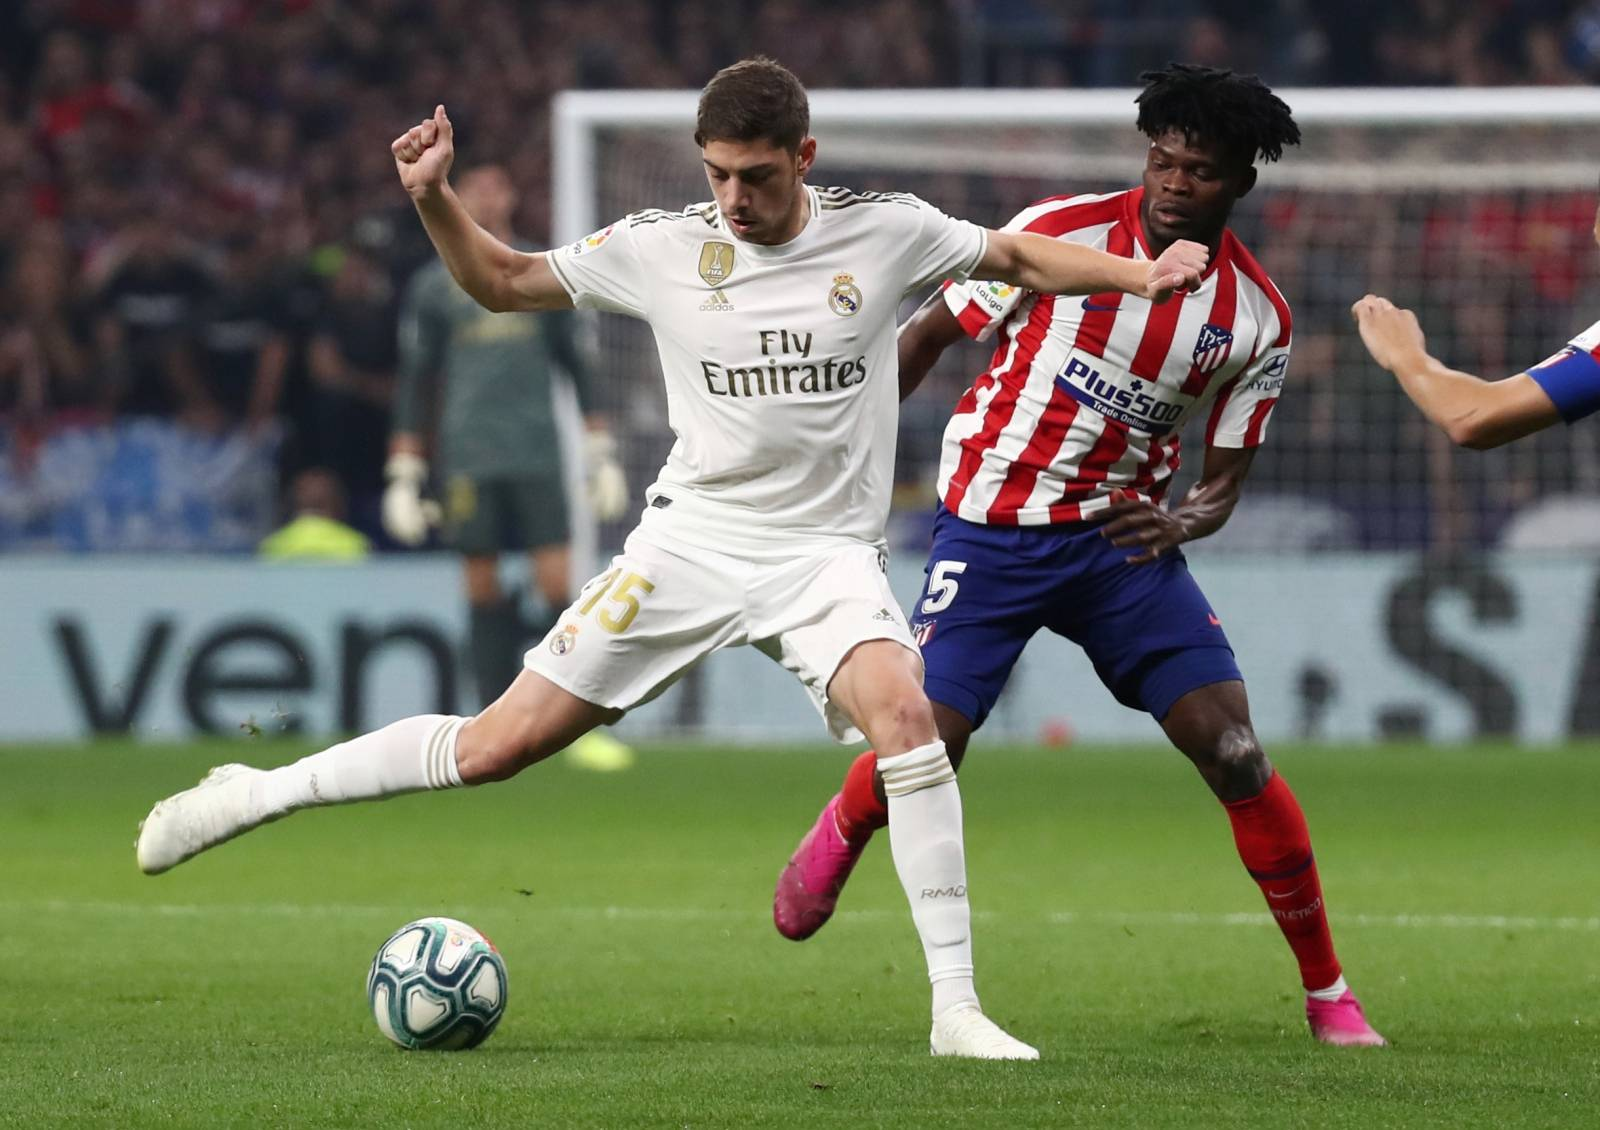 La Liga Santander - Atletico Madrid v Real Madrid